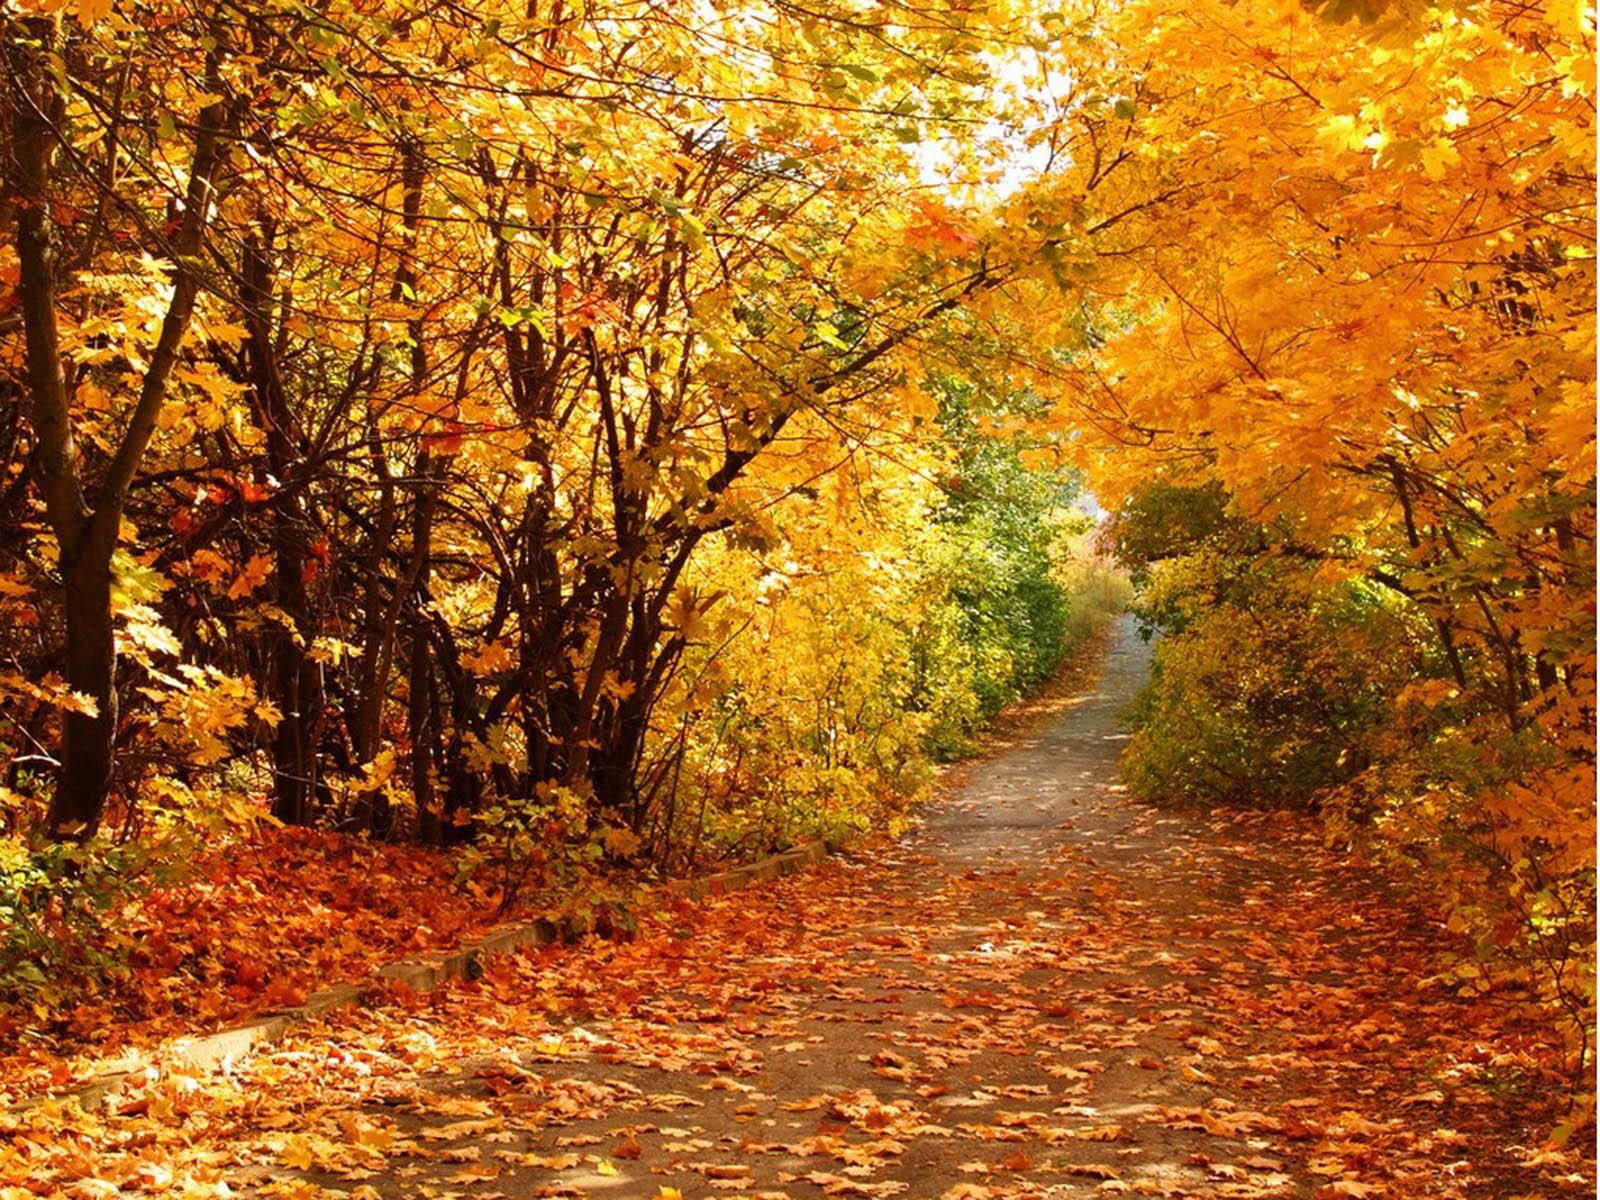 Wallpapers Beautiful Autumn Scenery Desktop BackgroundsBeautiful 1600x1200